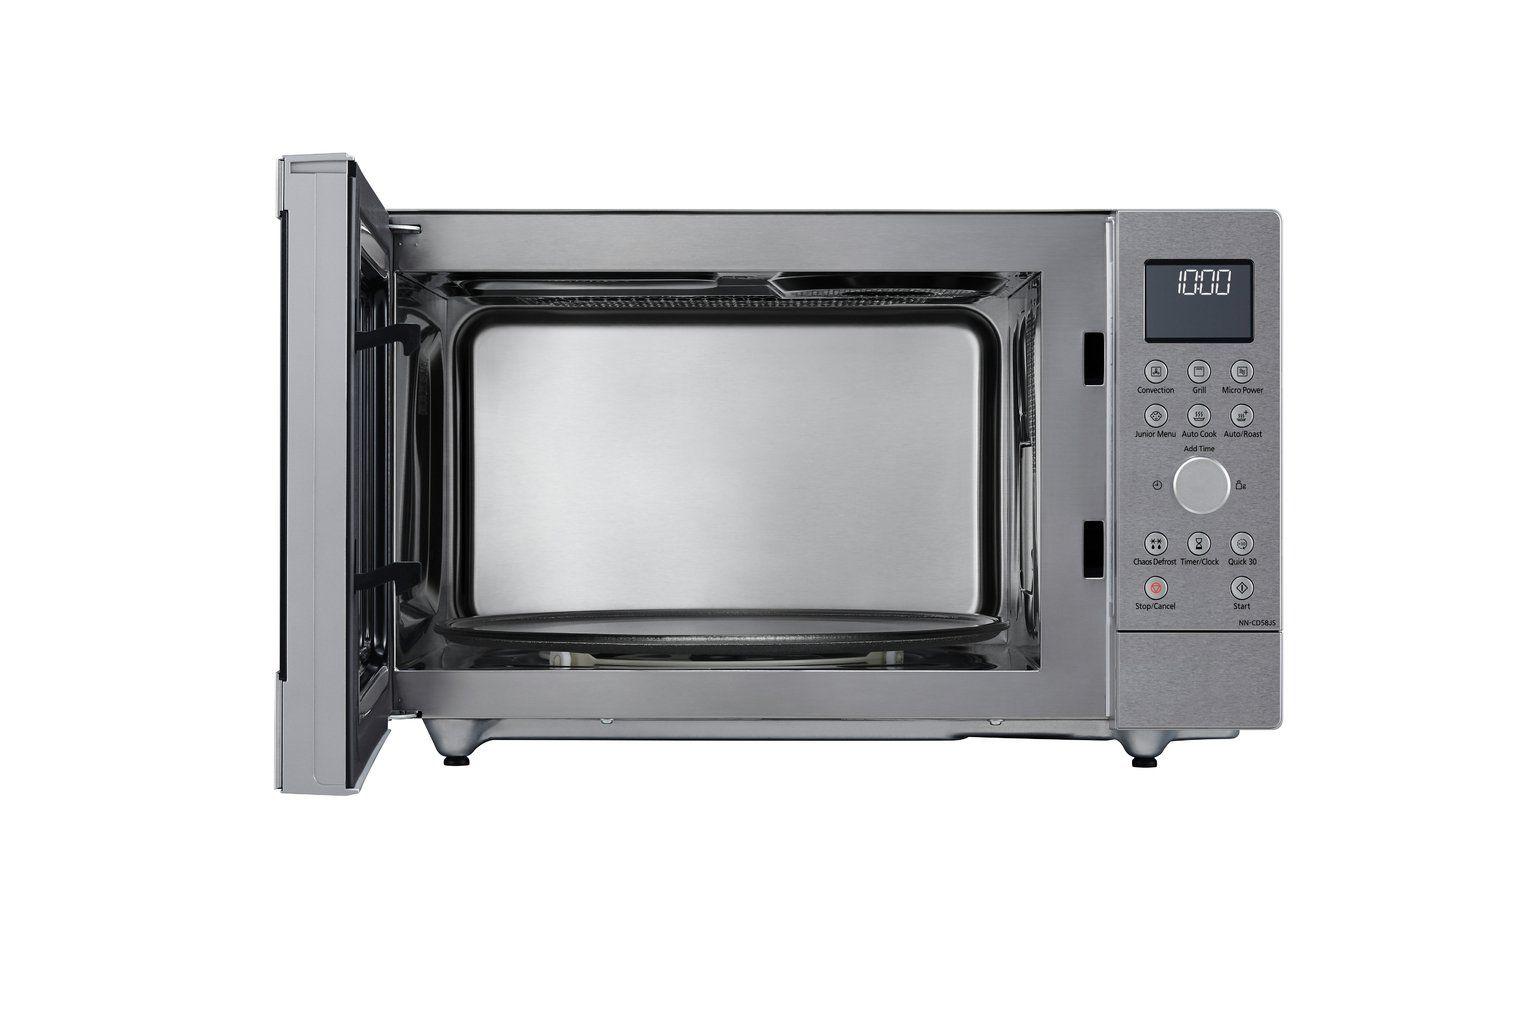 panasonic nn cd58js combination microwave